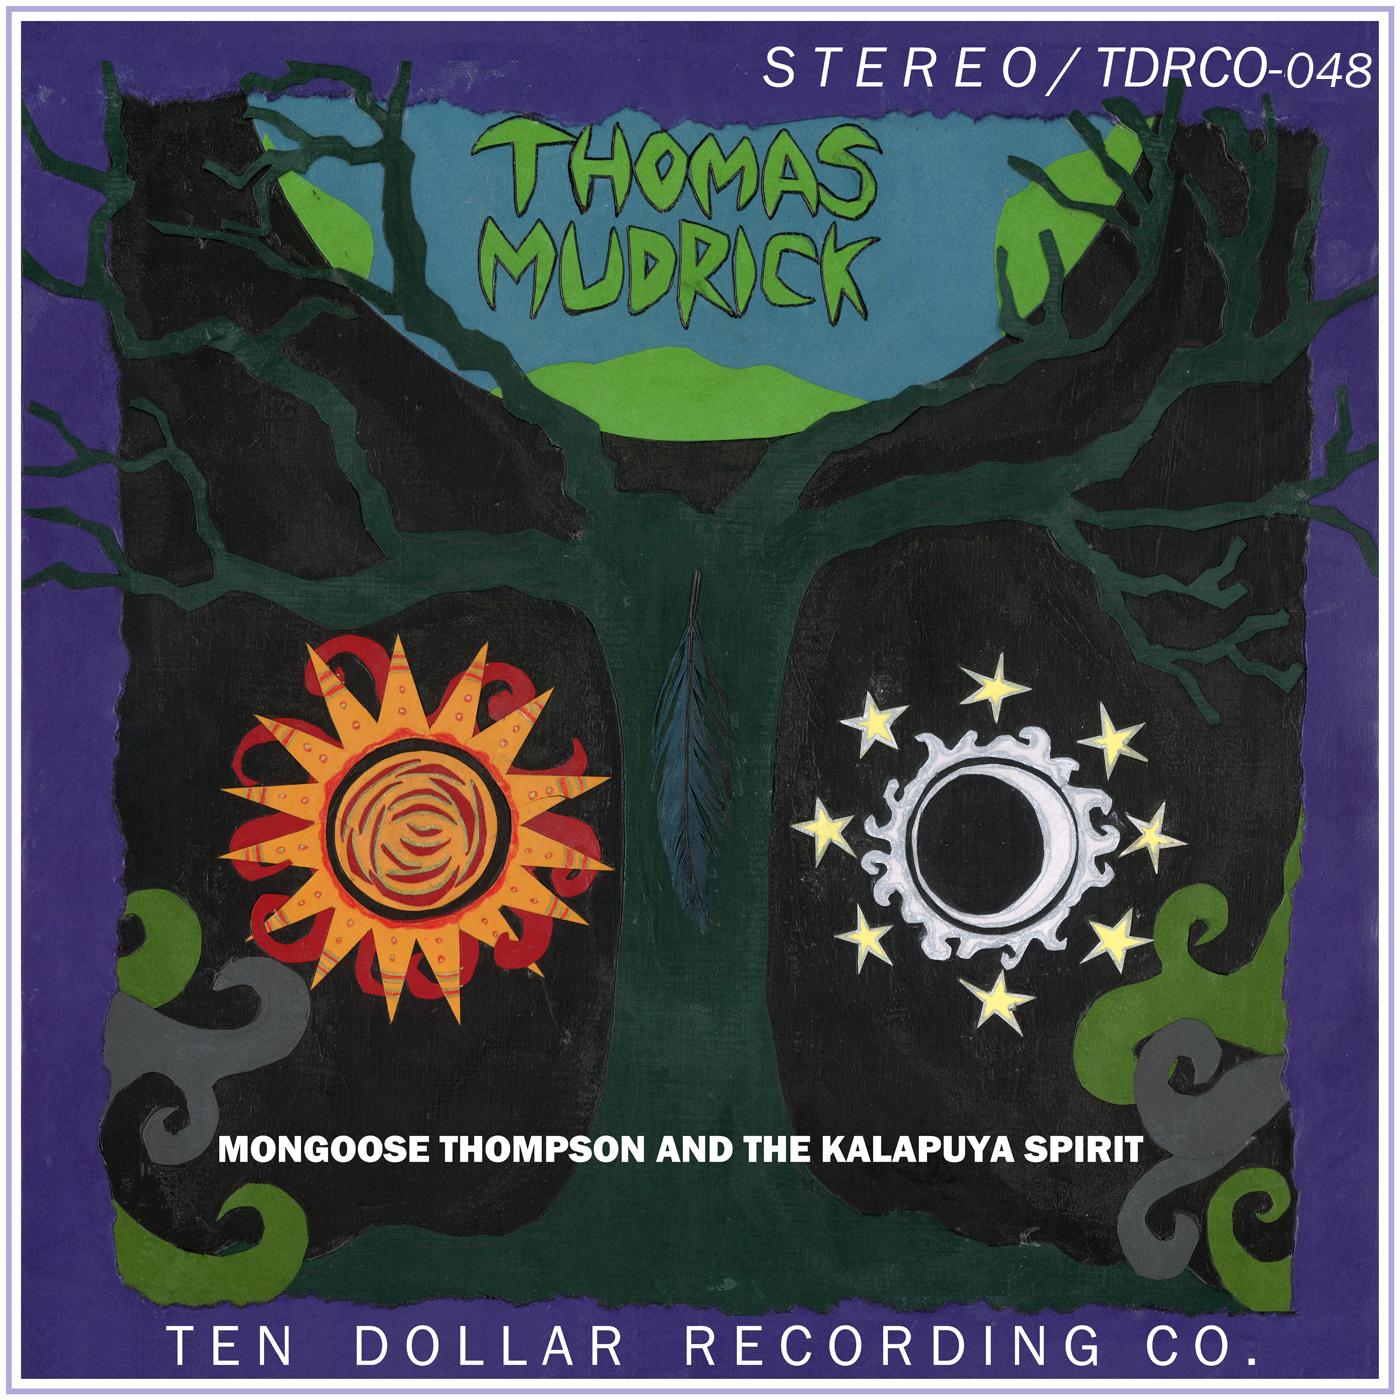 Thomas Mudrick - Mongoose Thompson and The Kalapuya Spirit